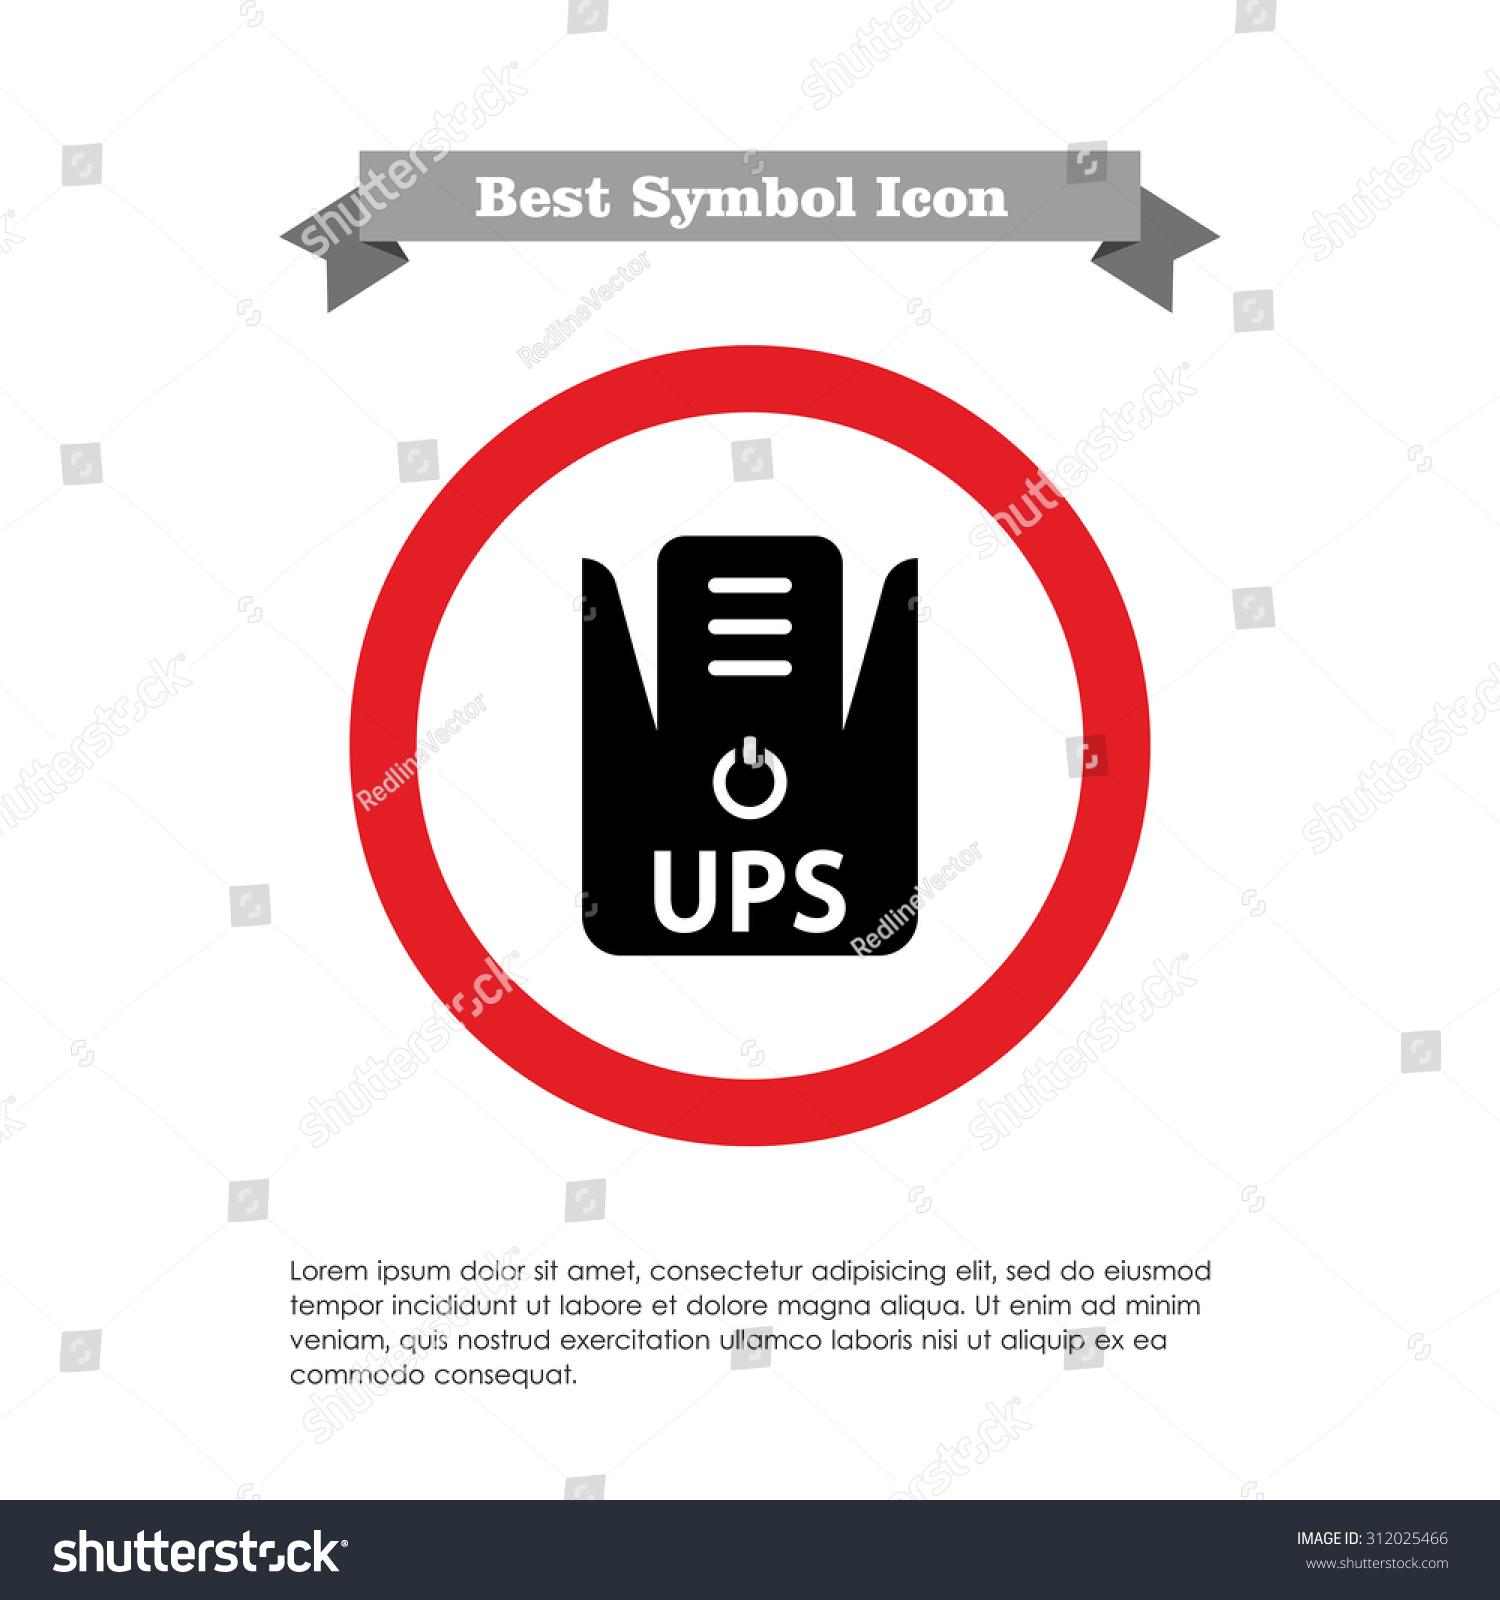 Icon uninterruptible power supply stock vector 312025466 icon of uninterruptible power supply buycottarizona